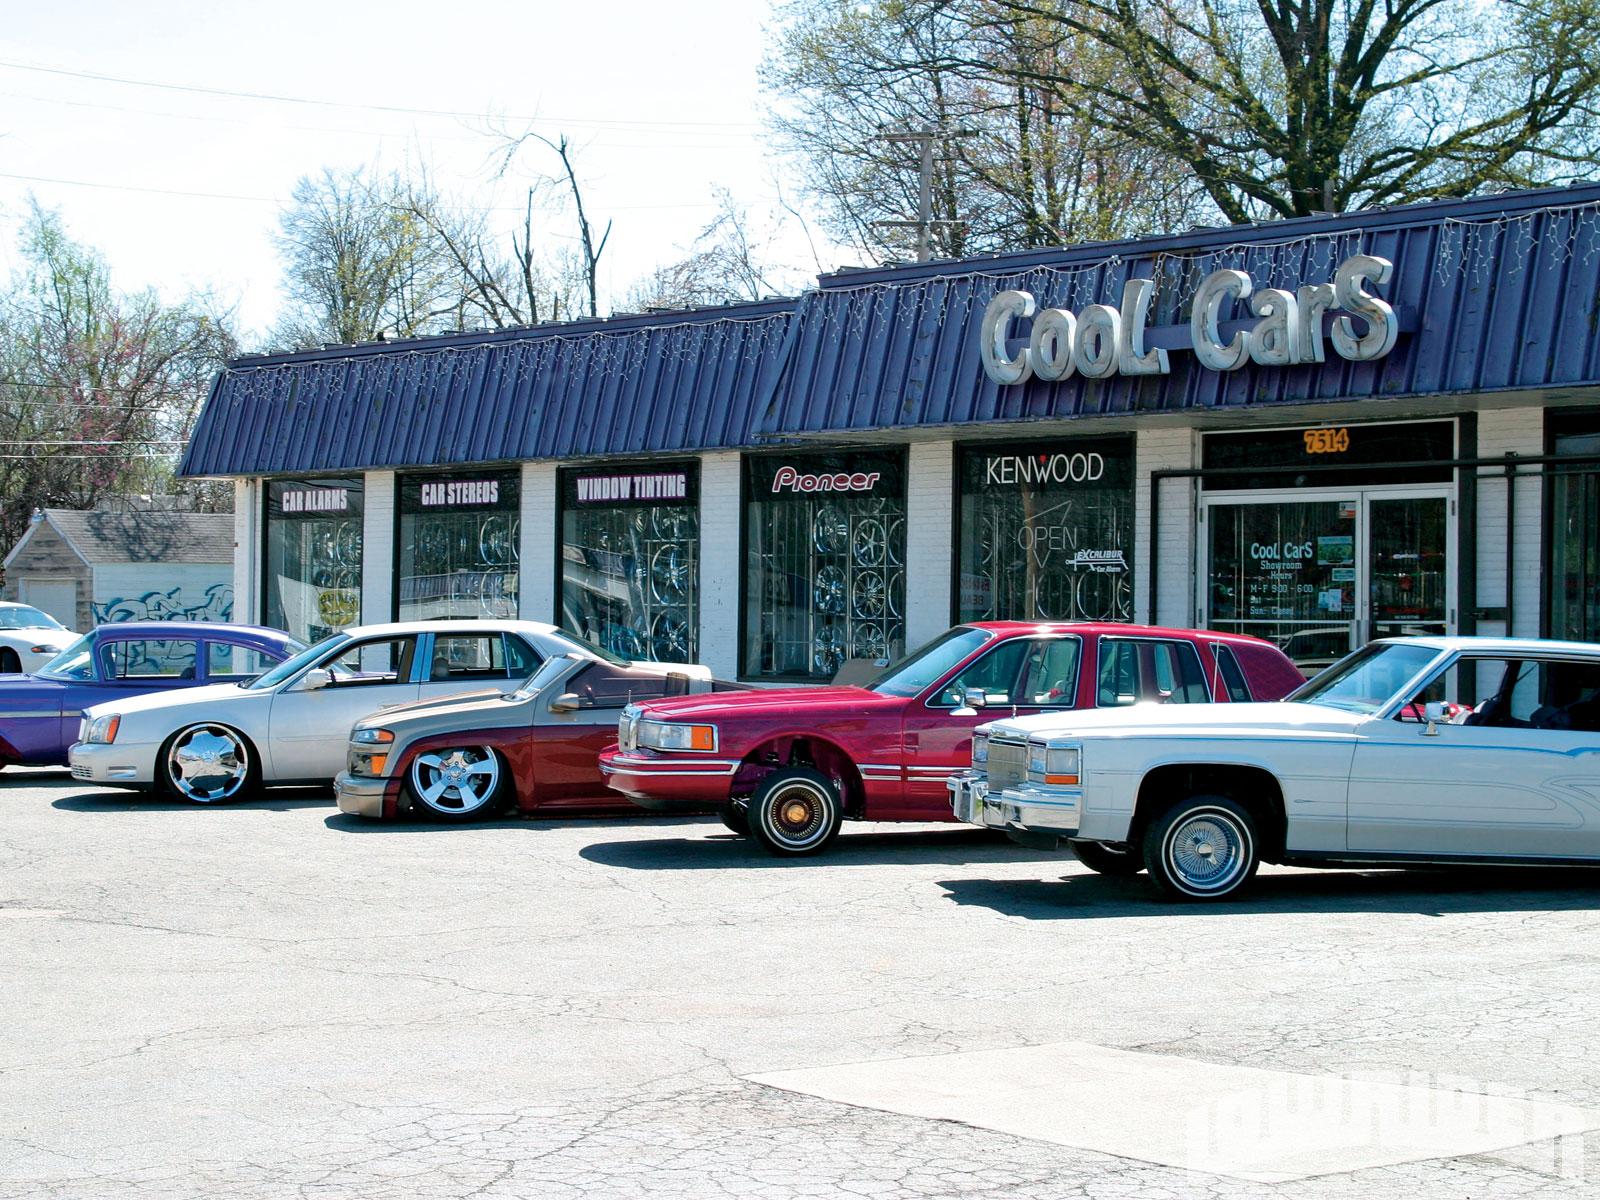 Cool cars engineering lowrider magazine